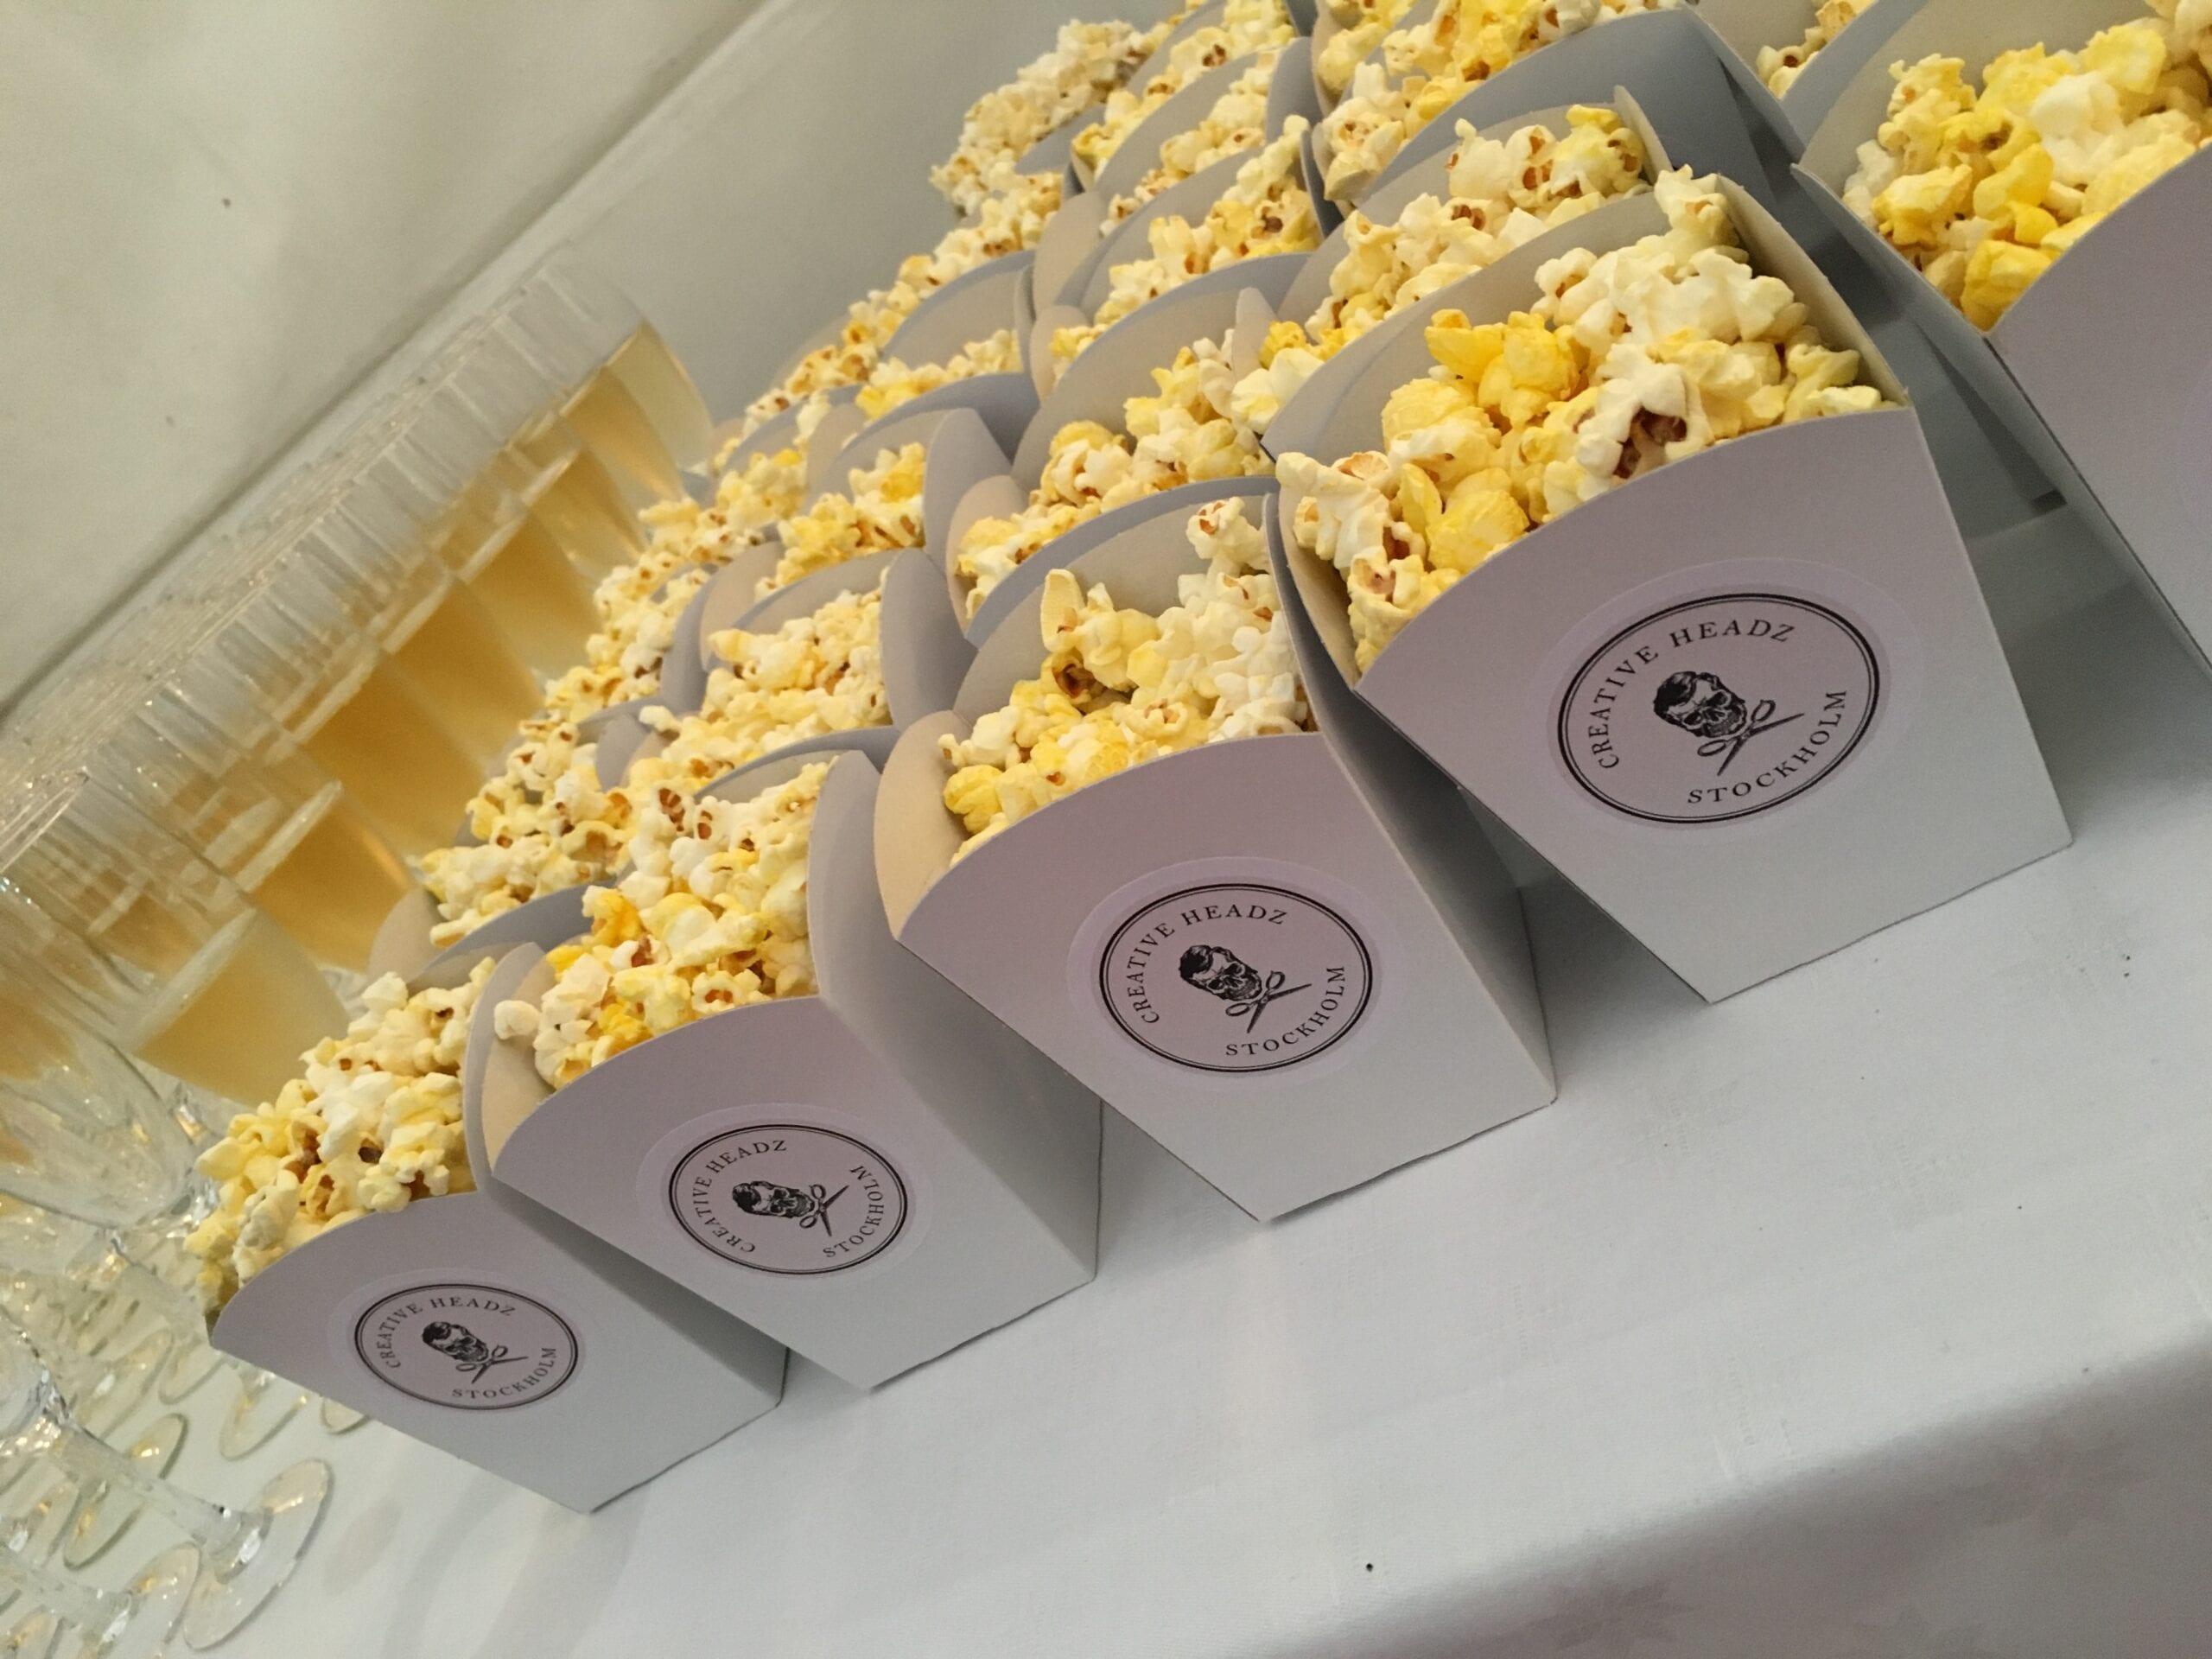 Vita-popcornbagare-med-etiketter